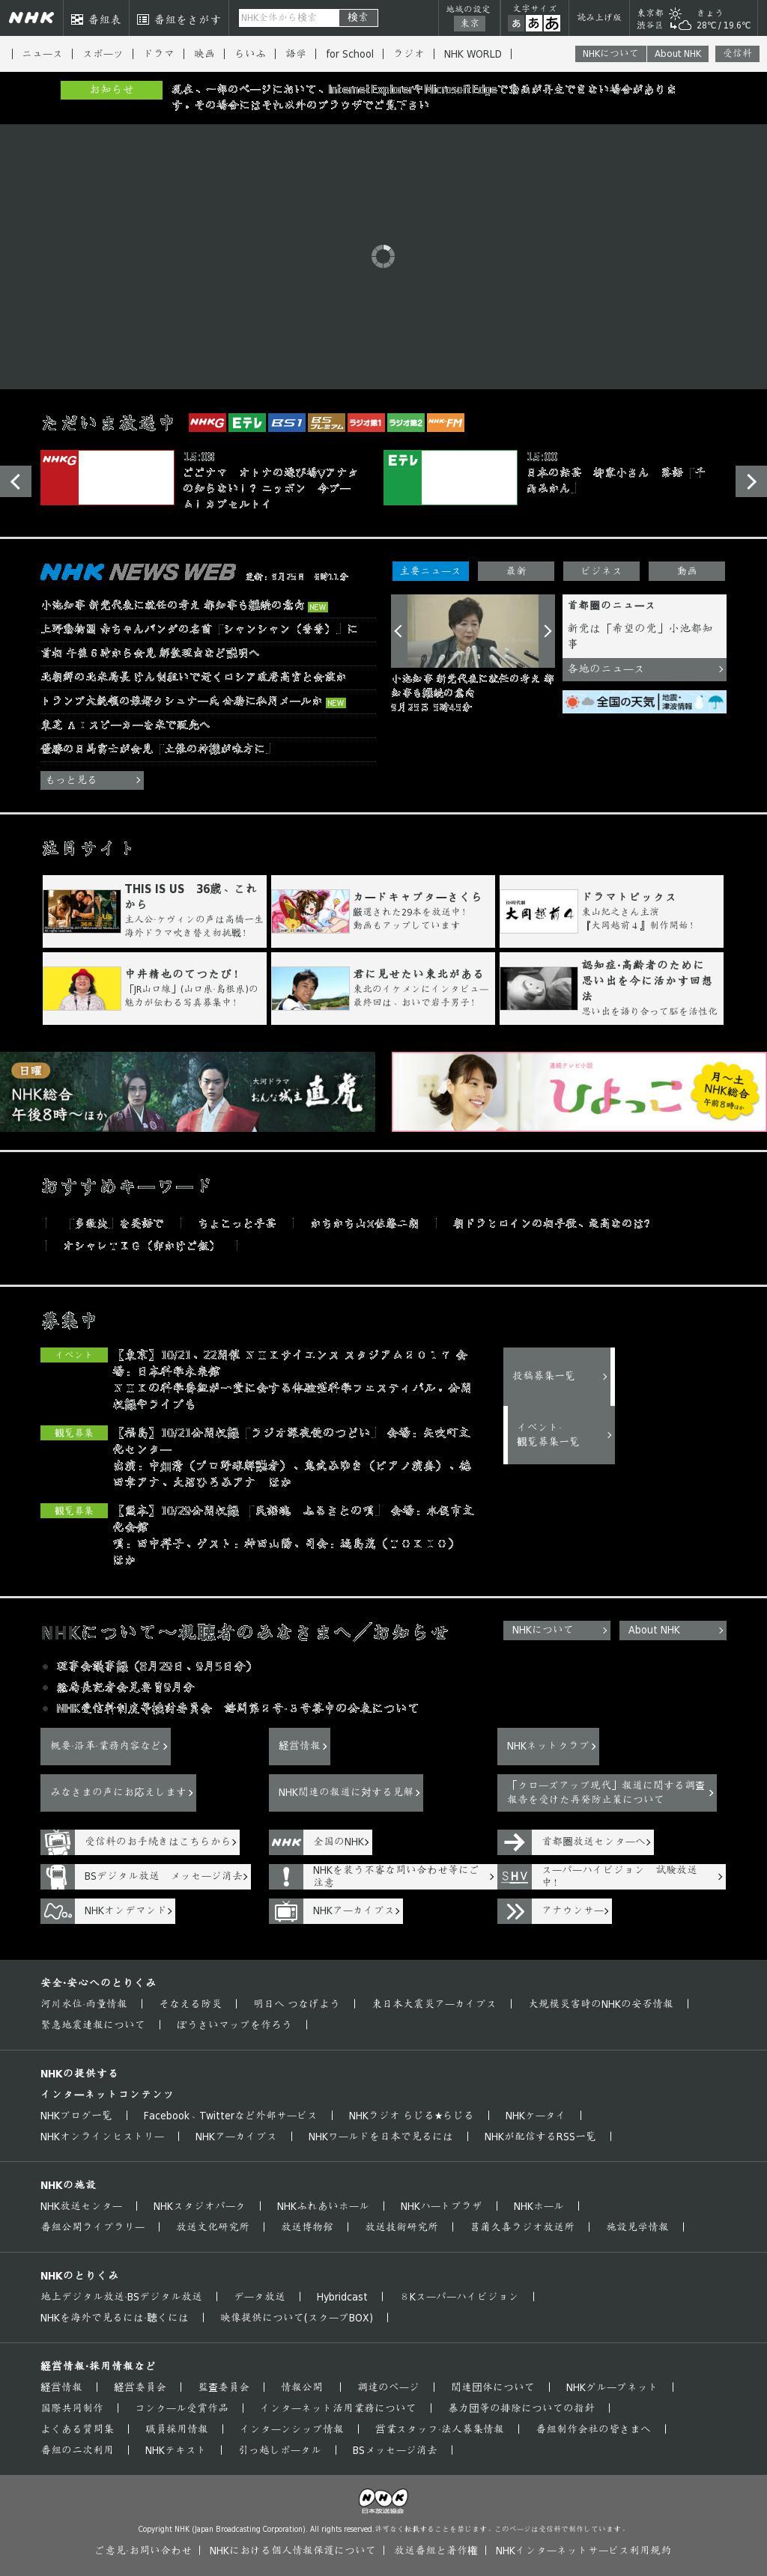 NHK Online at Monday Sept. 25, 2017, 6:15 a.m. UTC